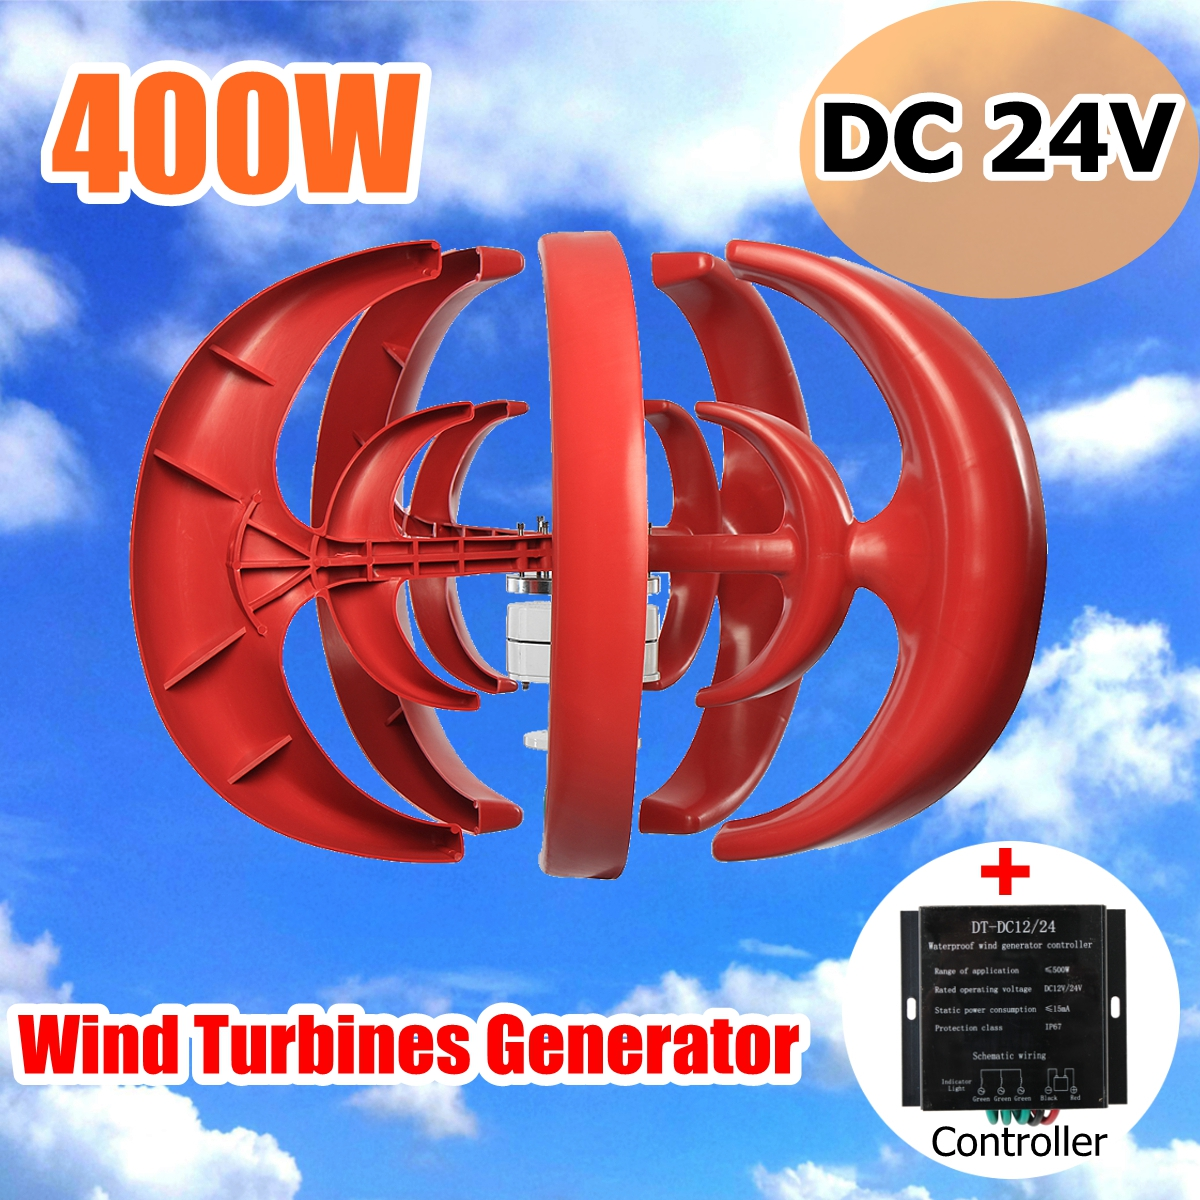 400W DC 12/24V 5 Blades Wind Turbine Generator Lanterns Vertical Axis Permanent Magnet Alternator with Controller